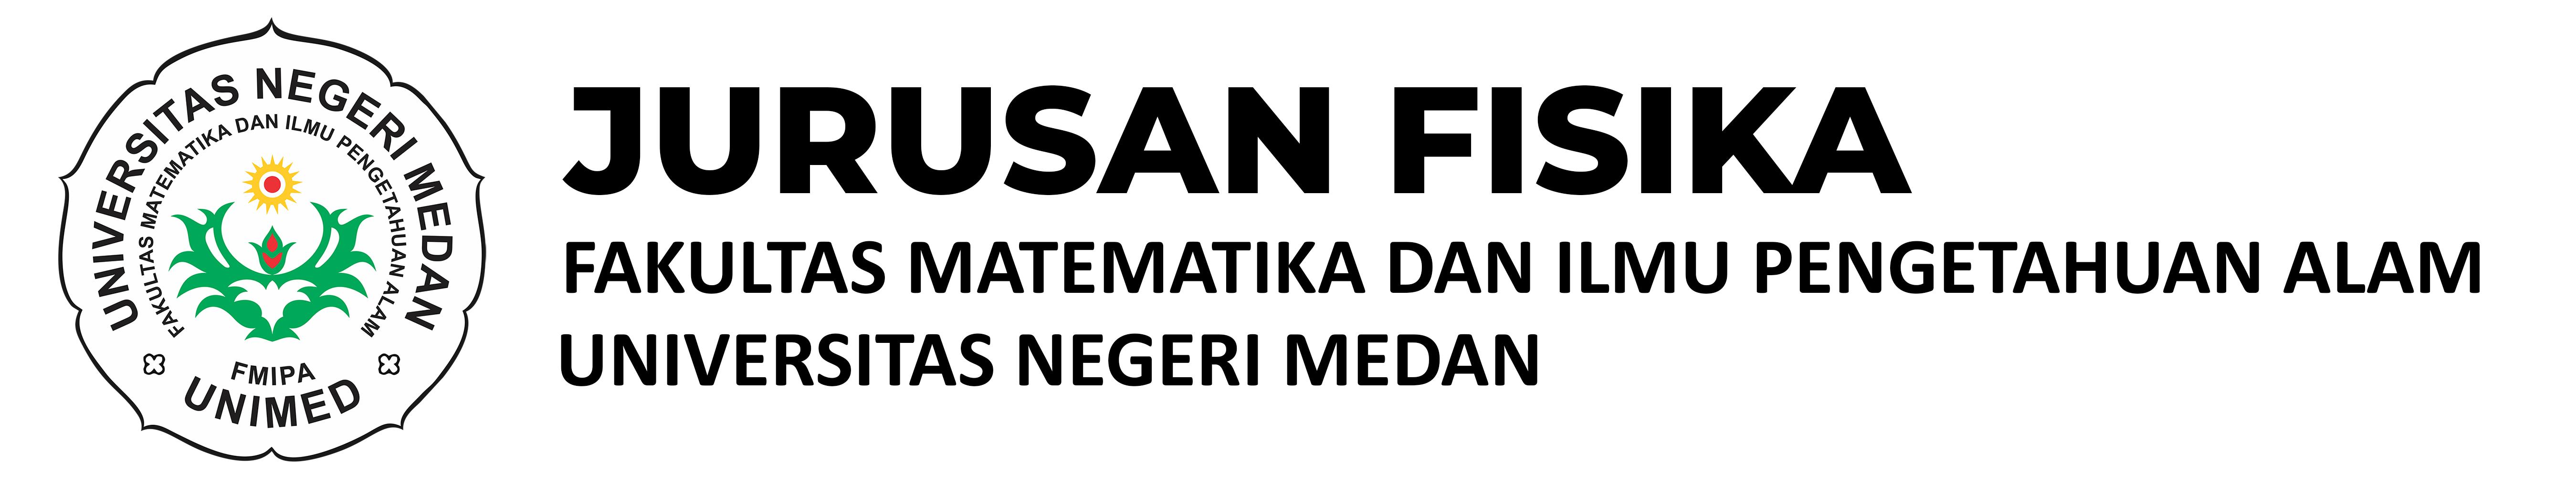 Jurusan Fisika Universitas Negeri Medan